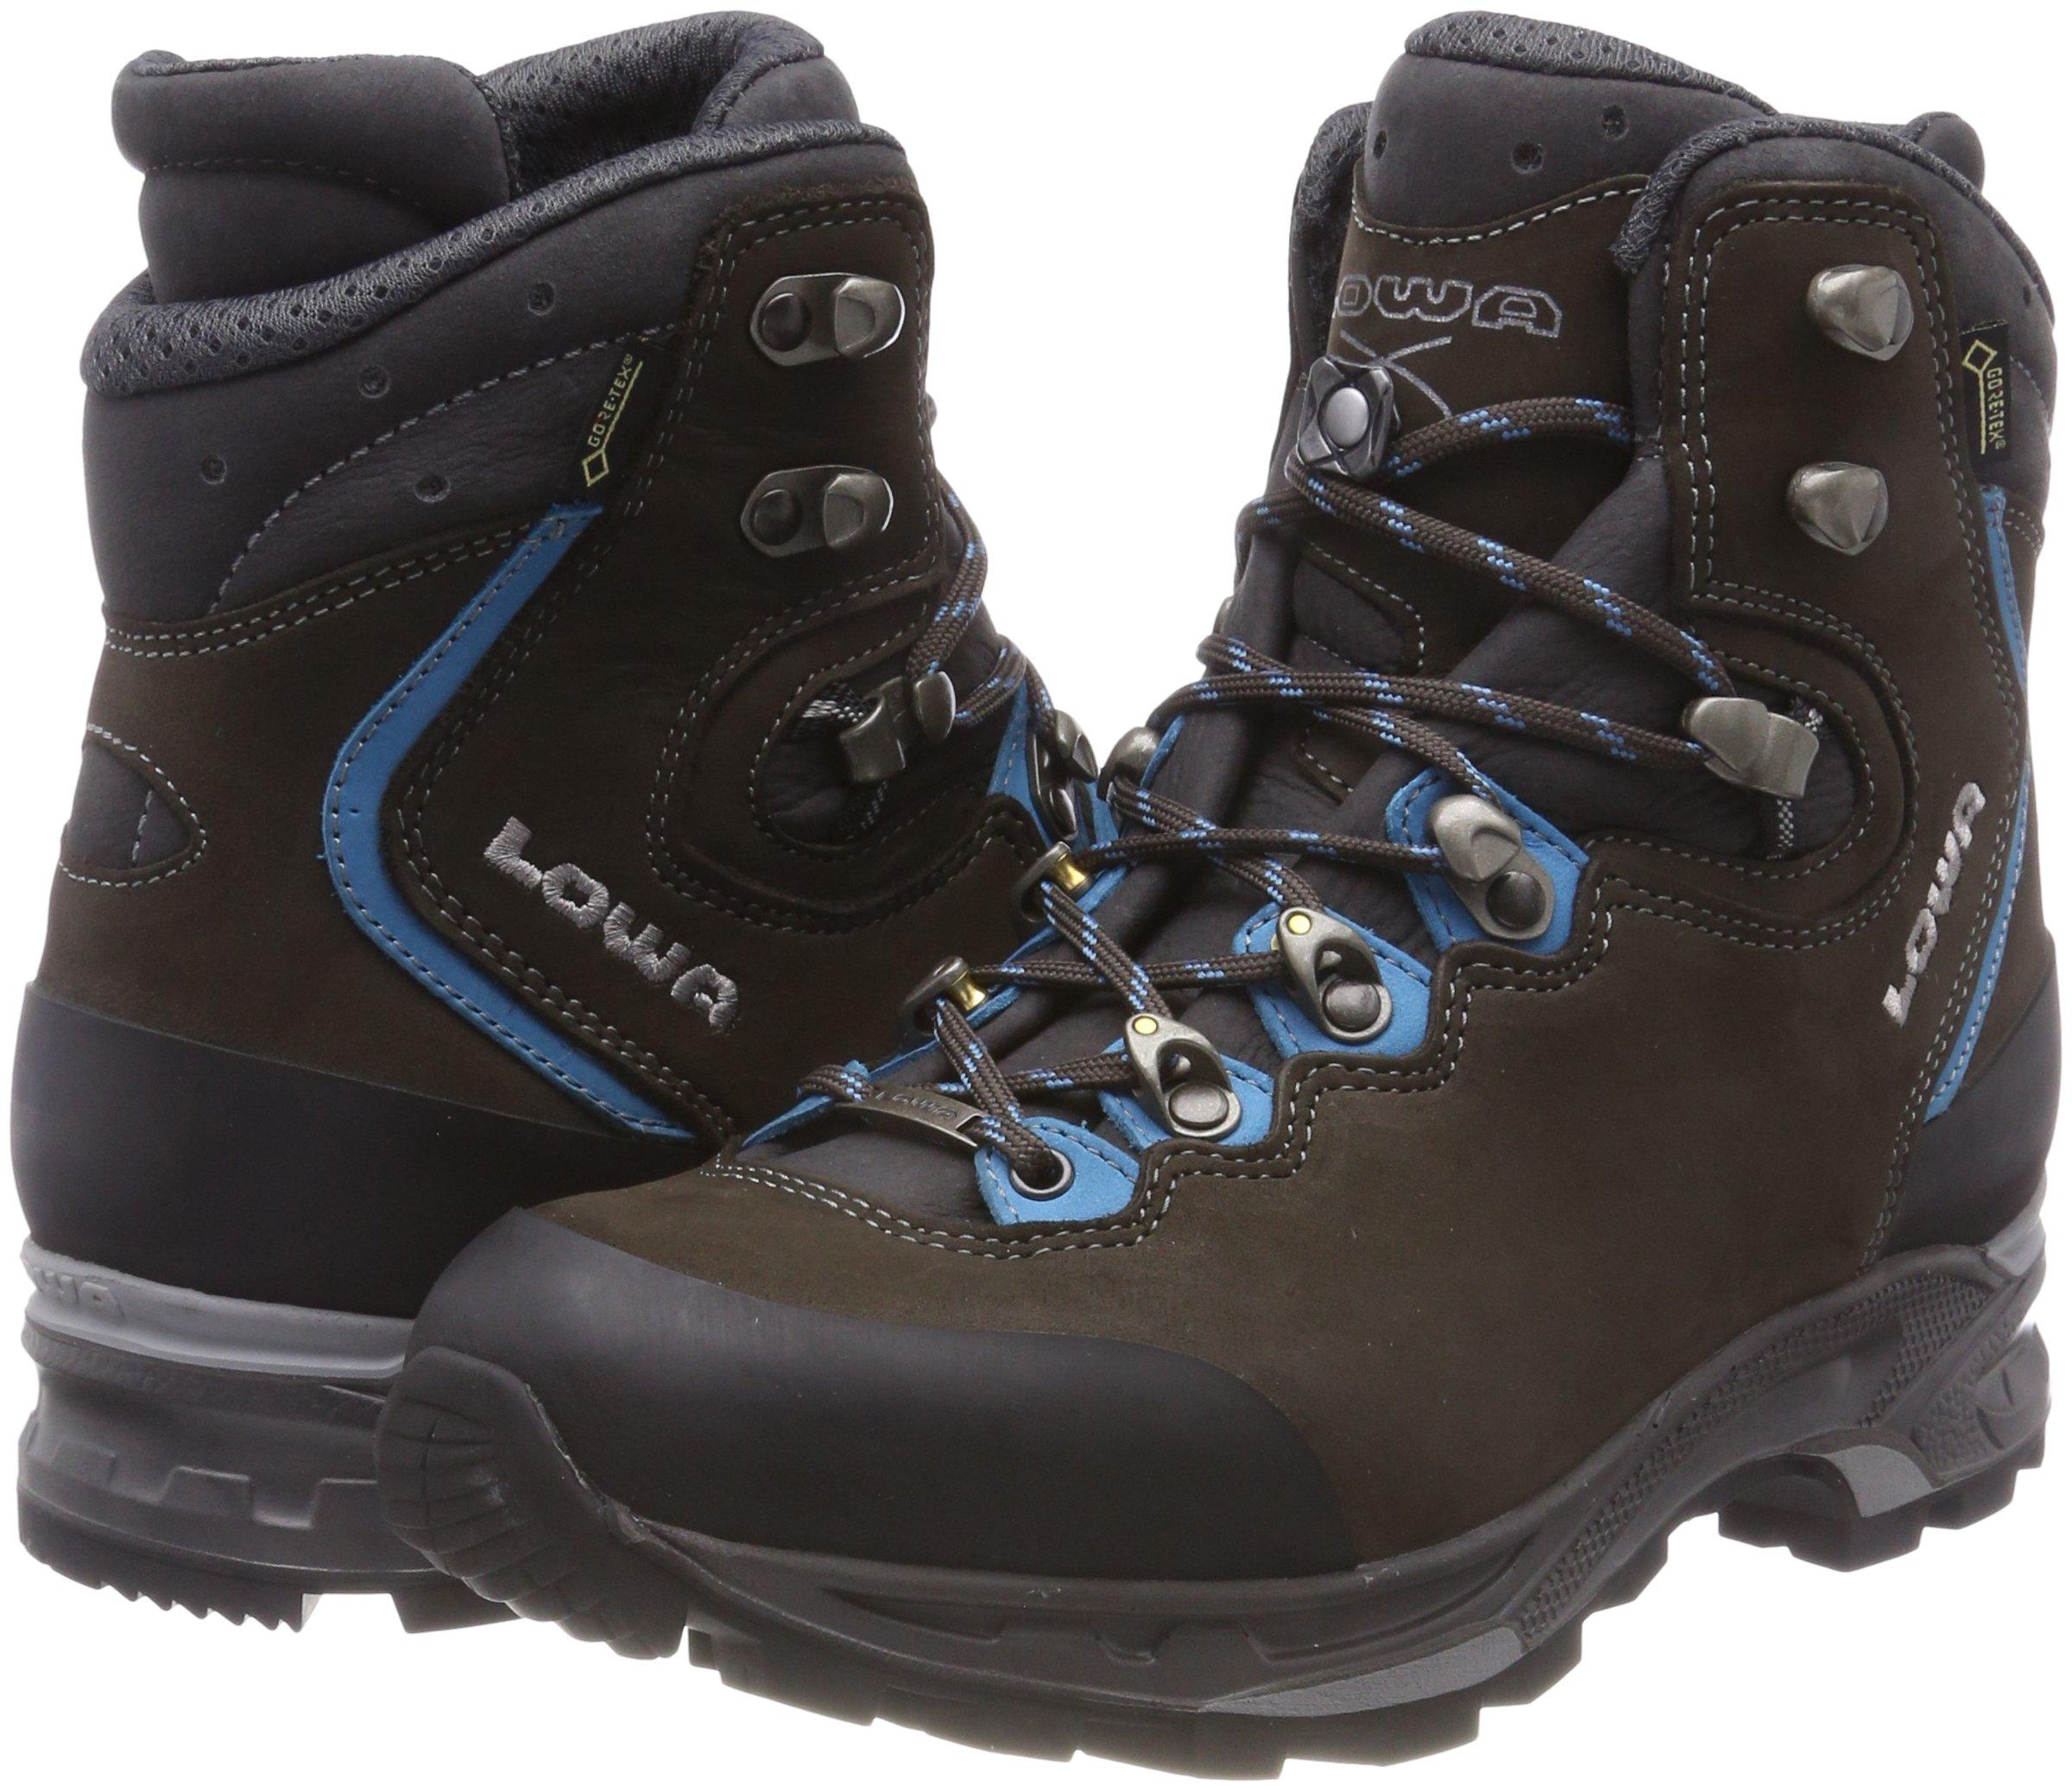 81bLHJk8QxL - Lowa Women's Mauria GTX Ws High Rise Hiking Boots